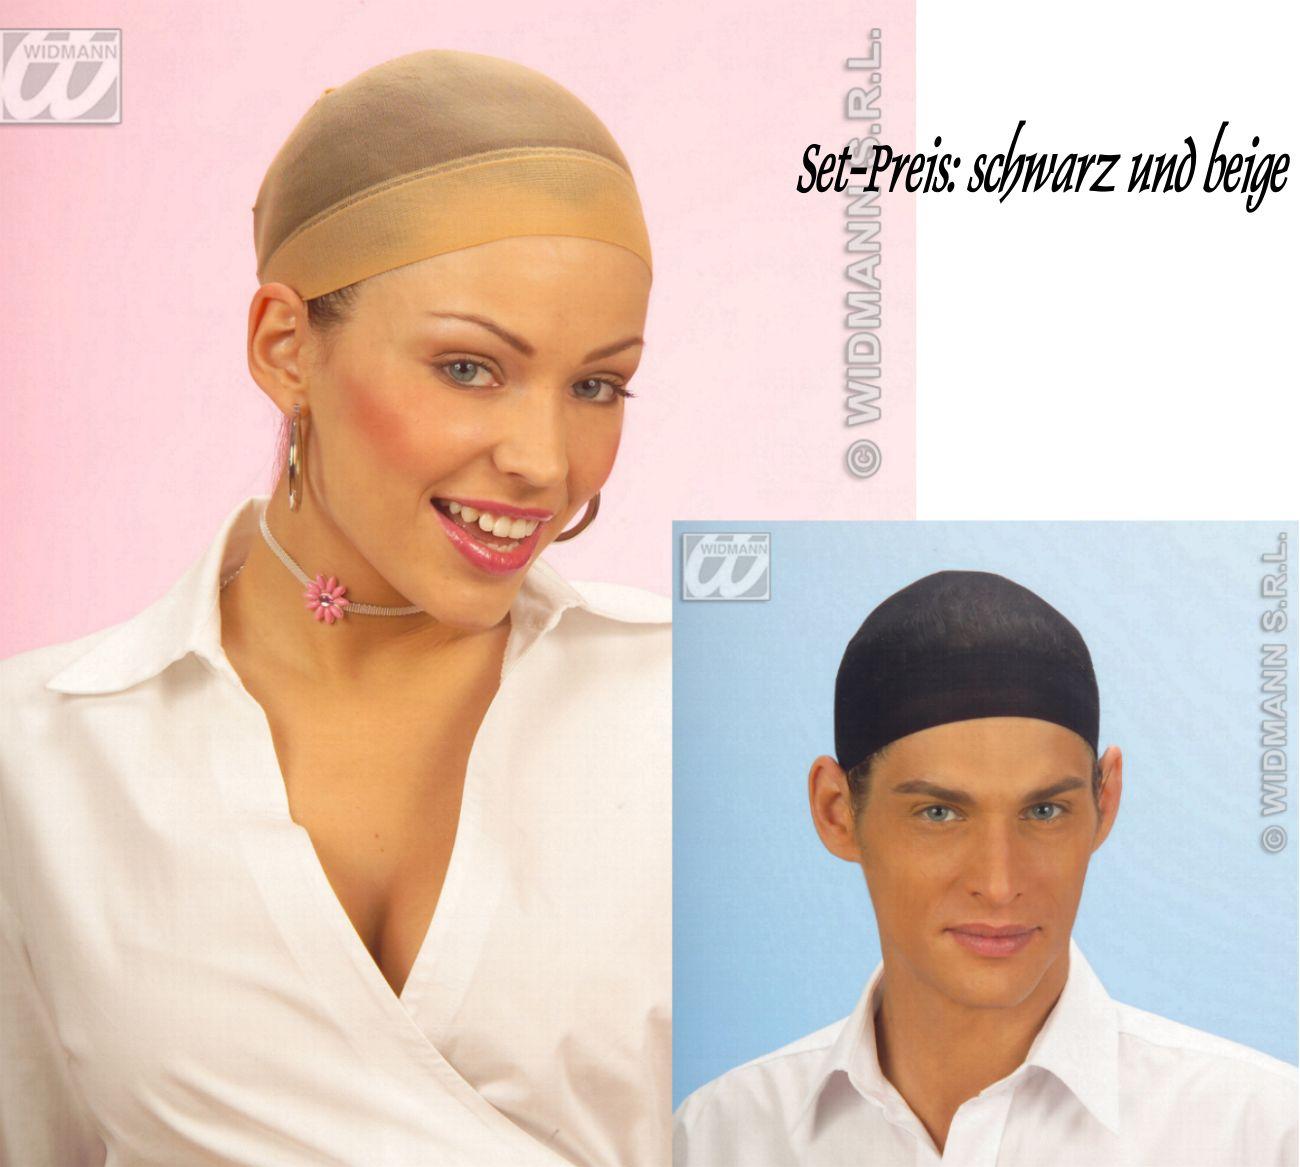 2 x Perücken- Haarnetze, Haarstrumpf, Haarnetz schwarz u beige